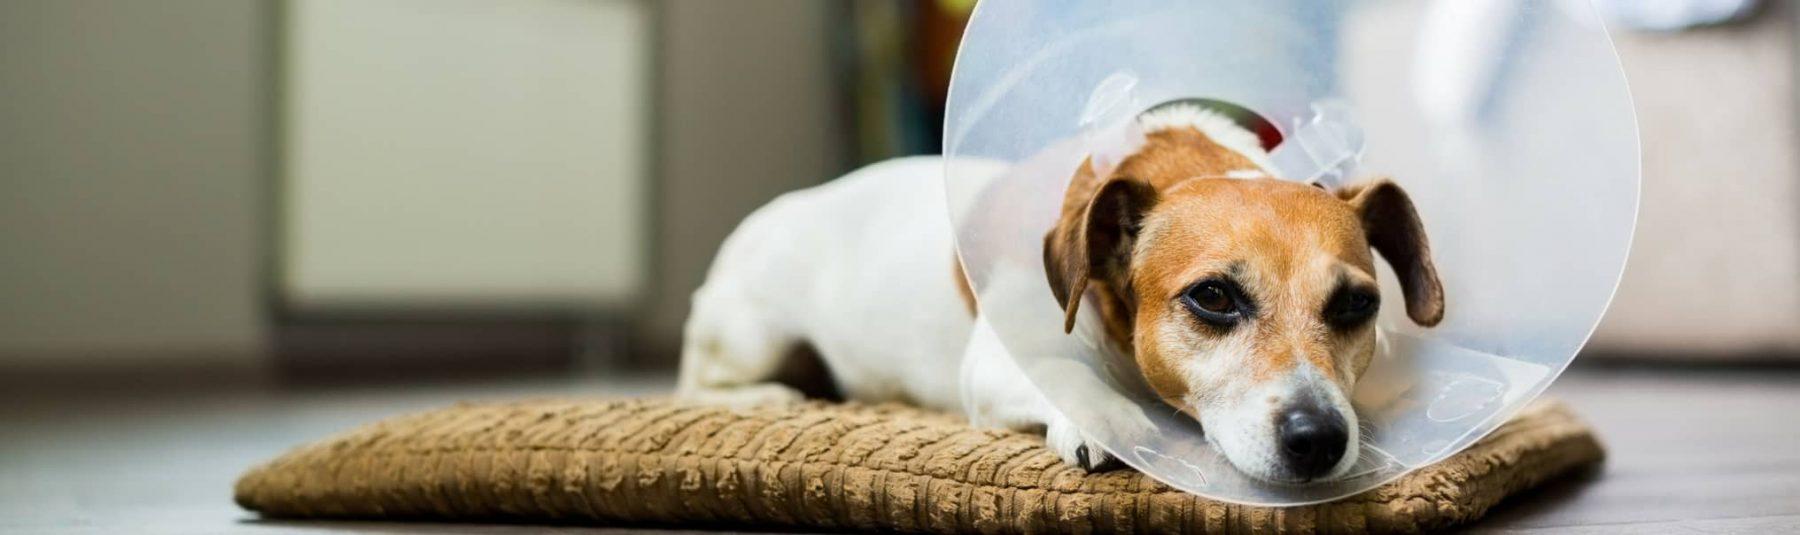 Service-dog-spay-surgery